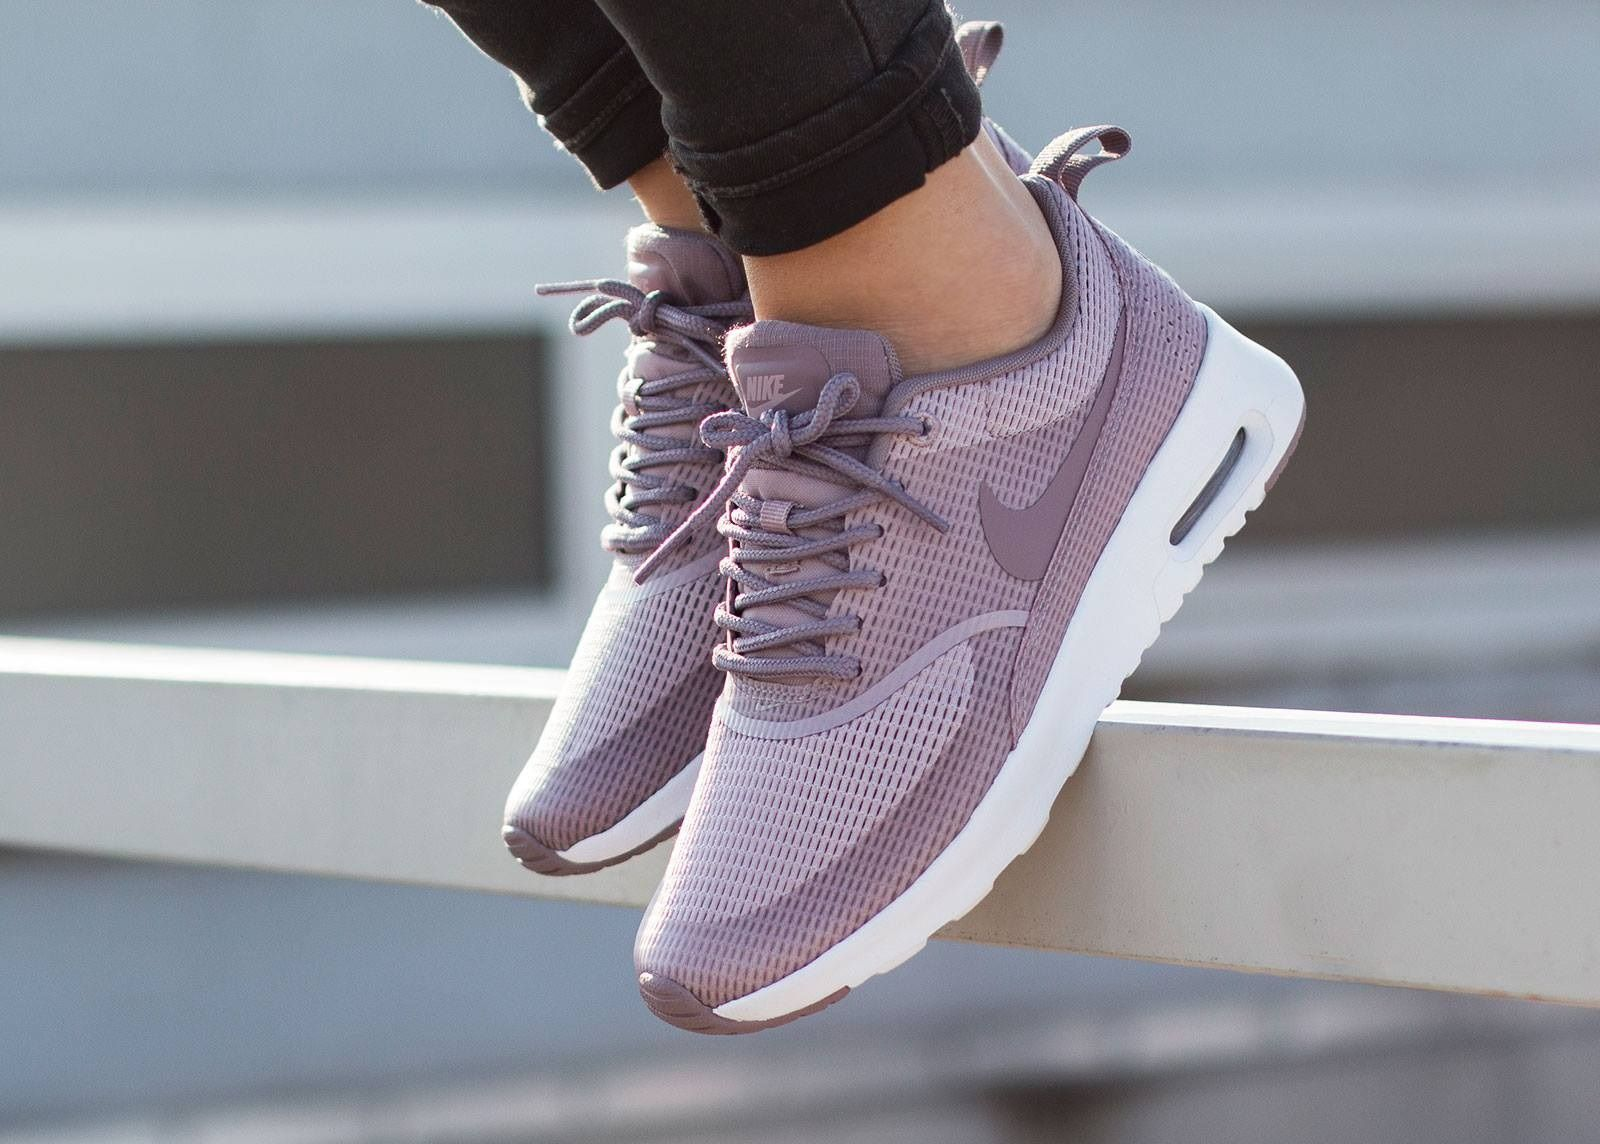 Zapatillas Nike Mujer De Moda 2018,Tenis Moda Nike